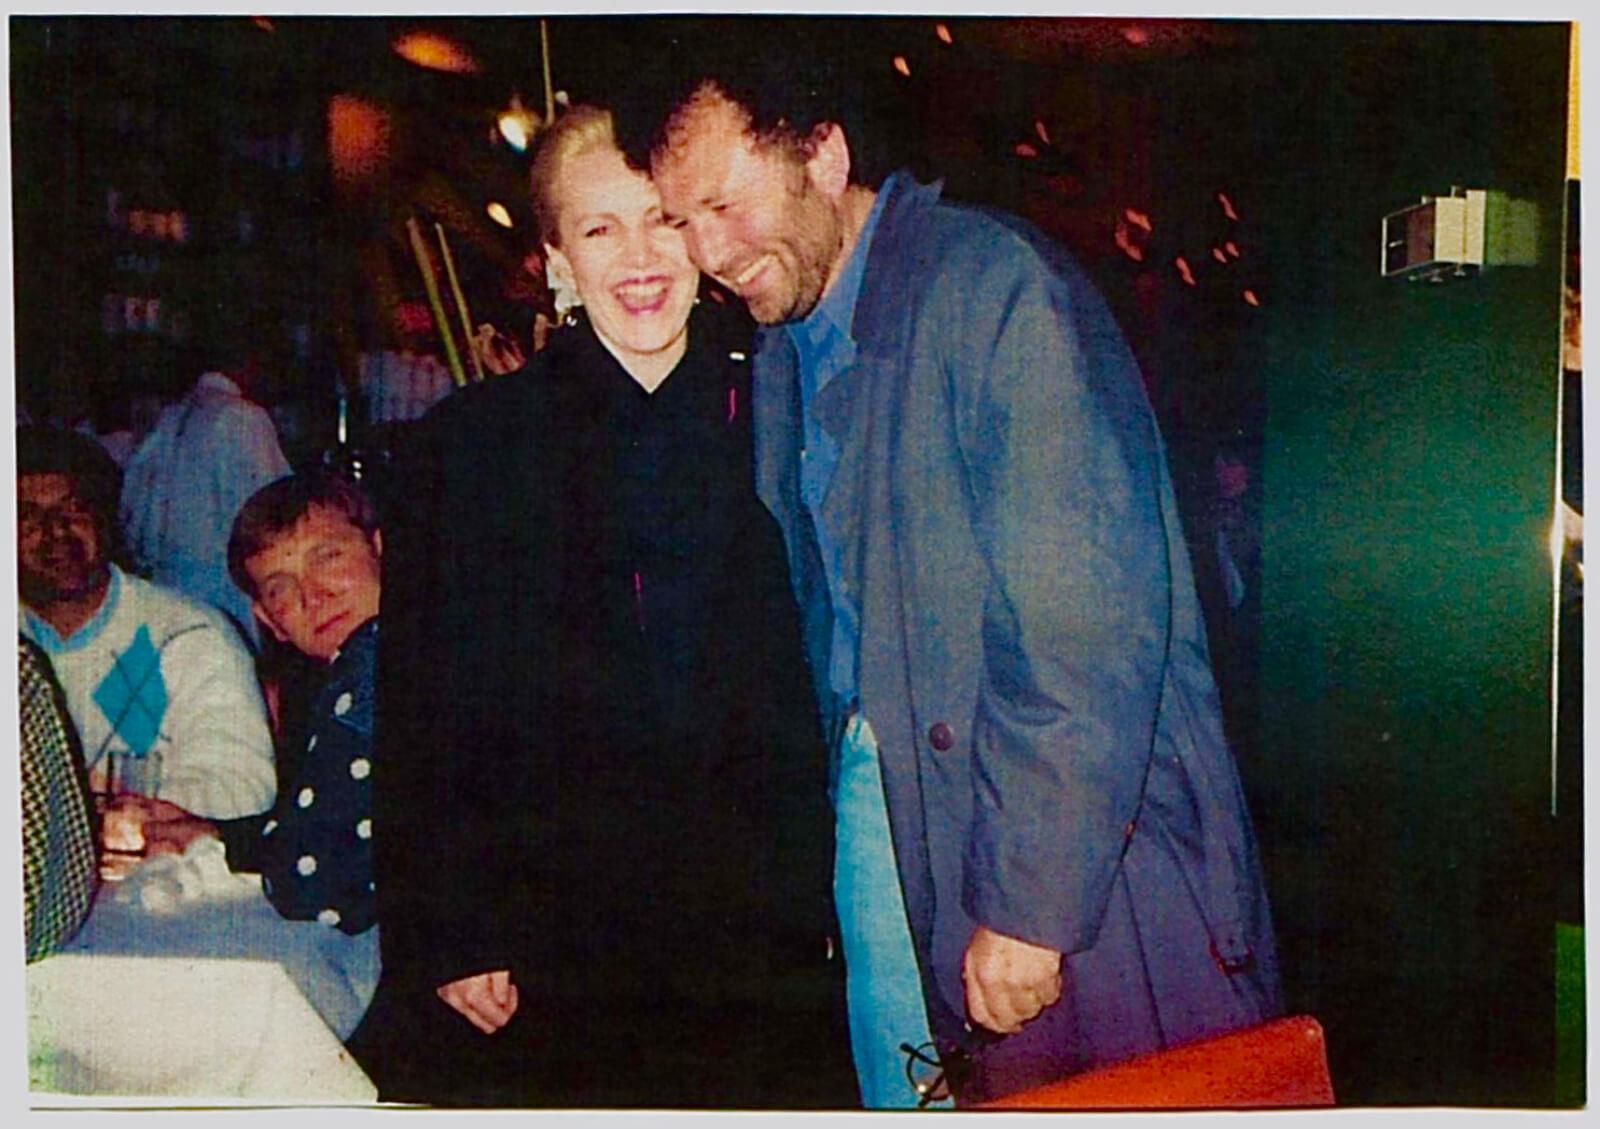 Susan Stroman and Mike Ockrent.